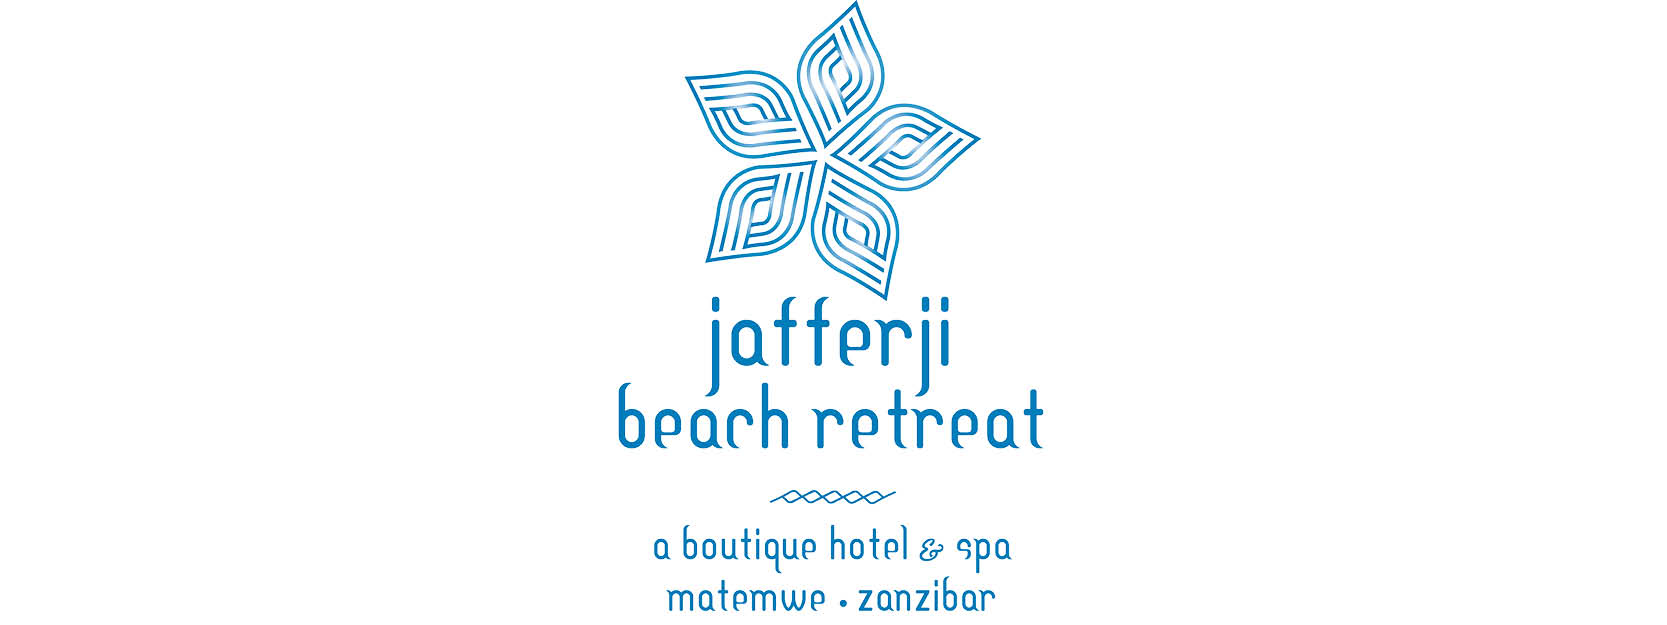 Jaferji Beach retreat